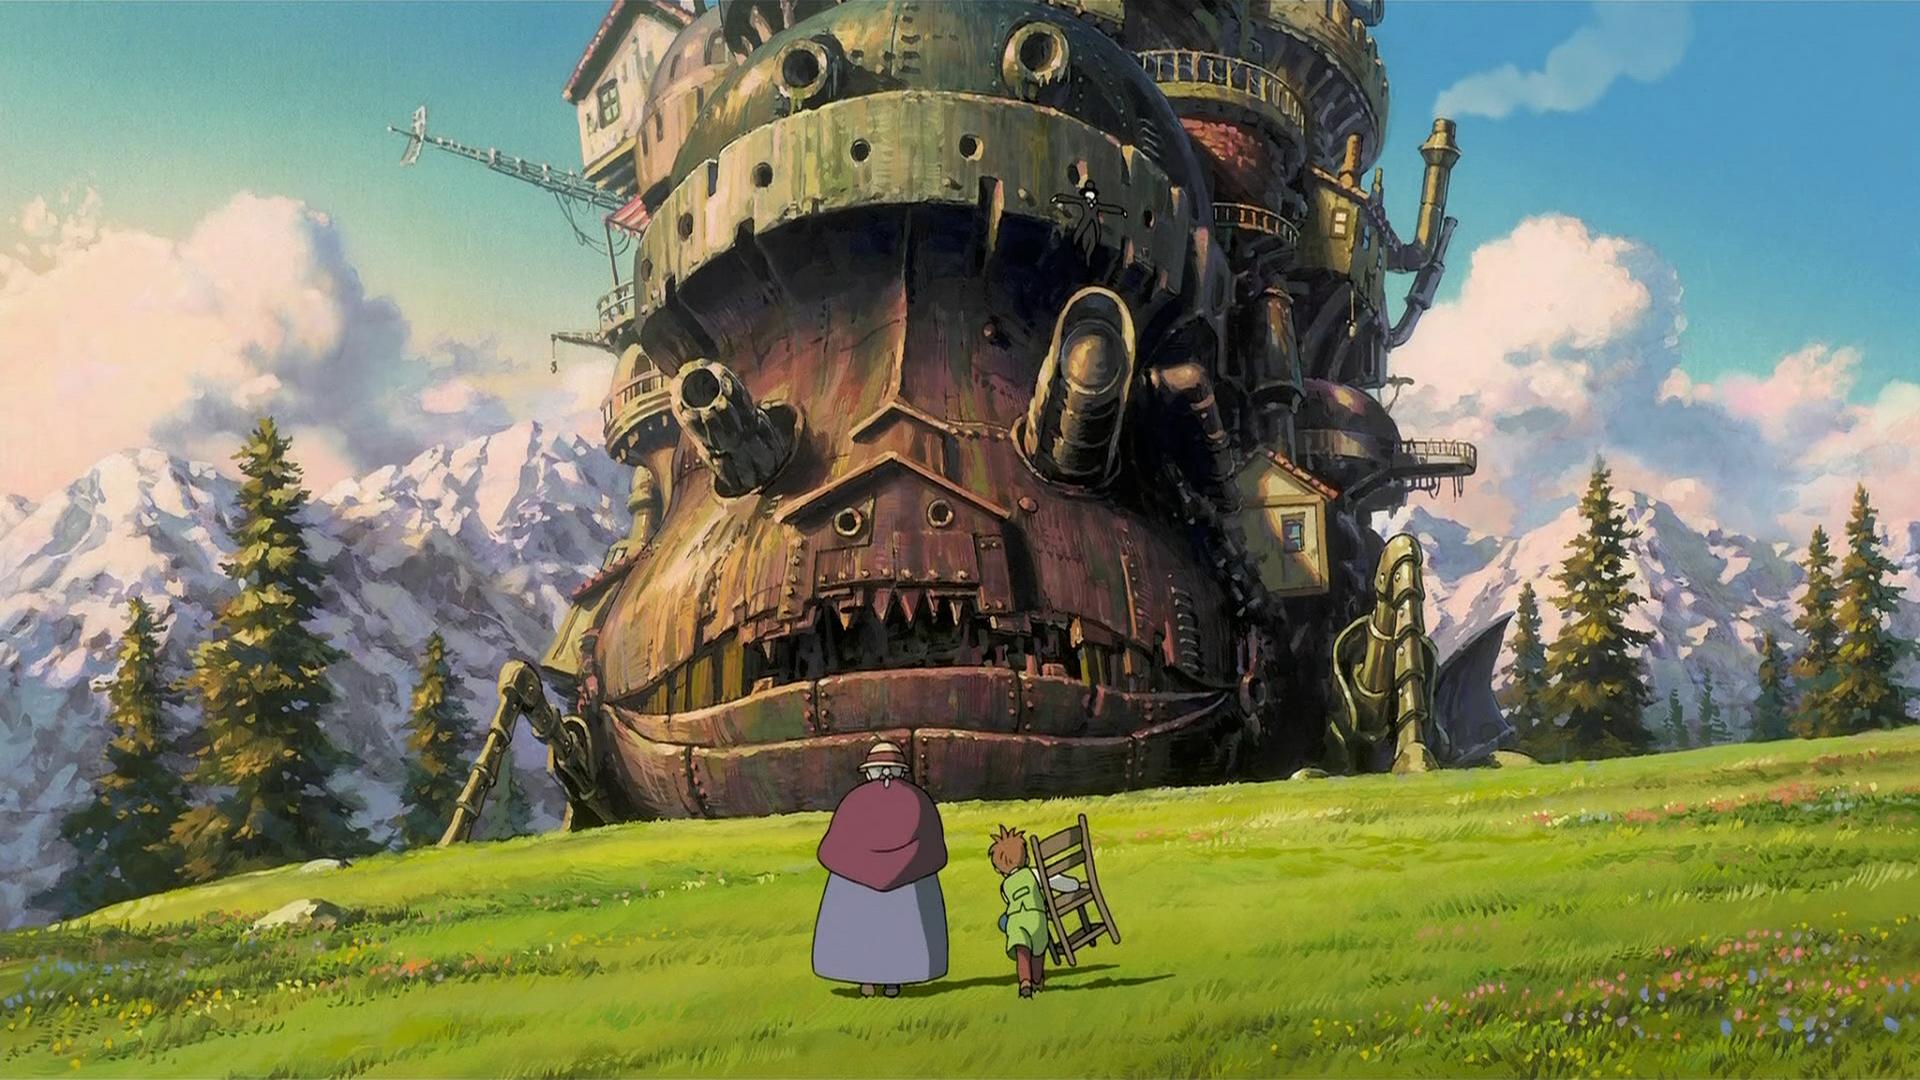 Howl's Moving Castle / Studio Ghibli